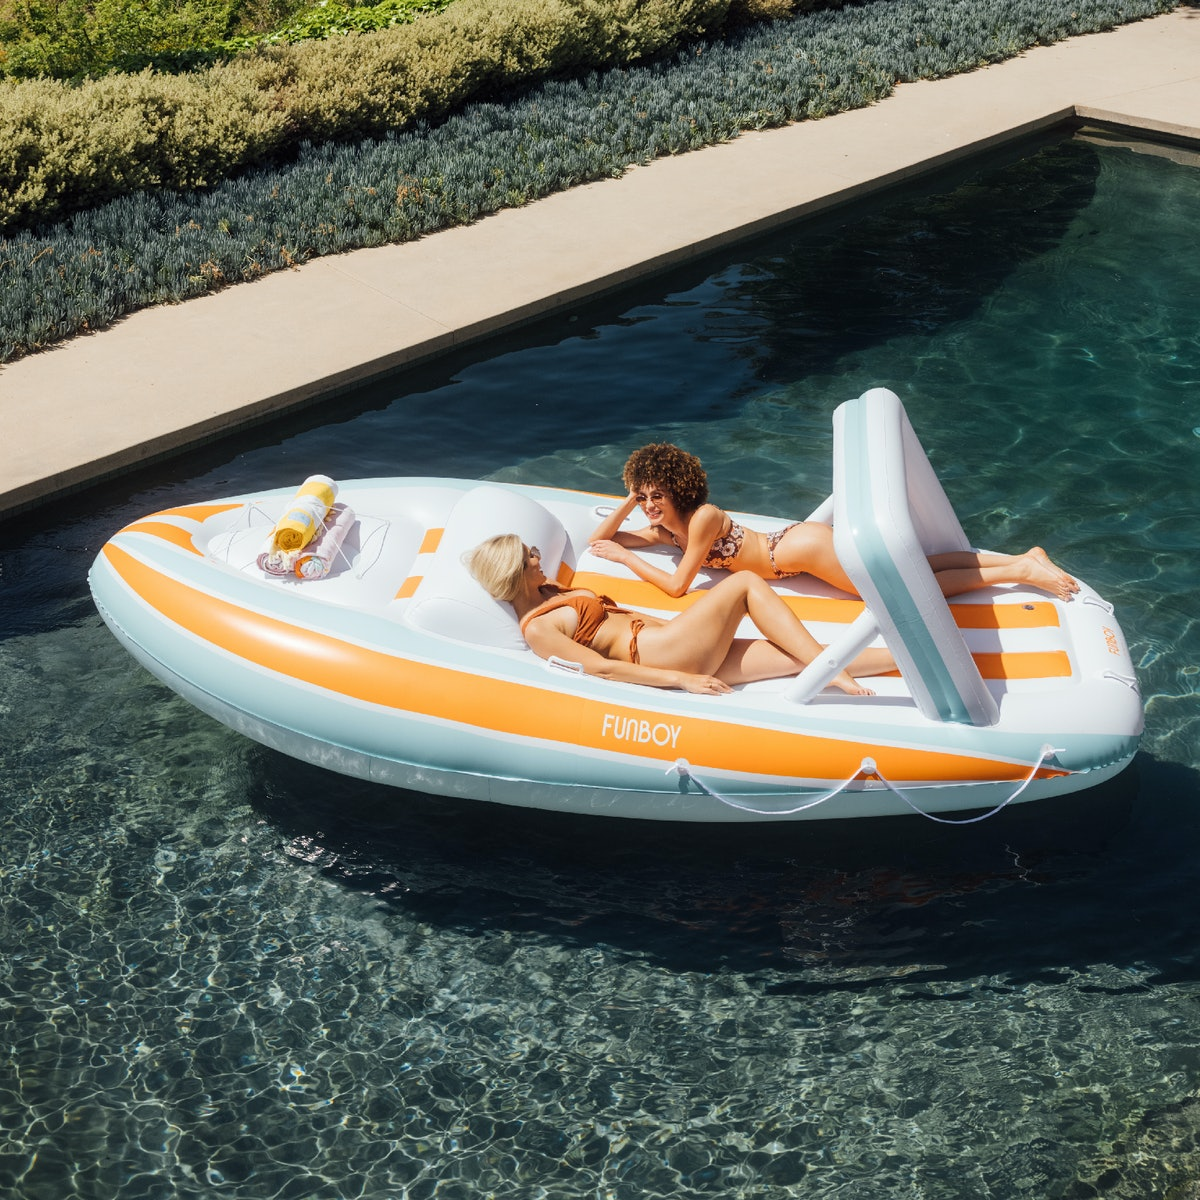 FUNBOY's Mega Yacht pool float is a major upgrade.